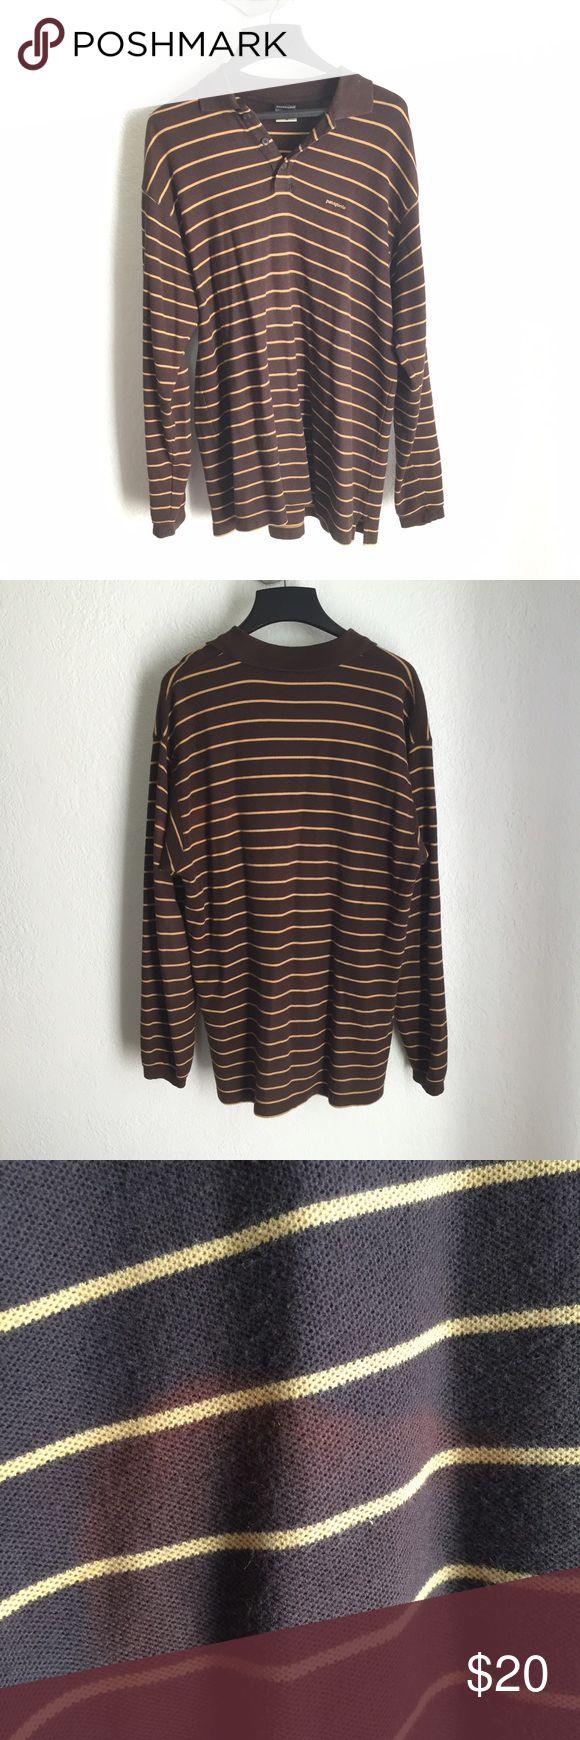 Men's Longsleeve Patagonia shirt Size medium couple marks as shown in photo Patagonia Tops Tees - Long Sleeve